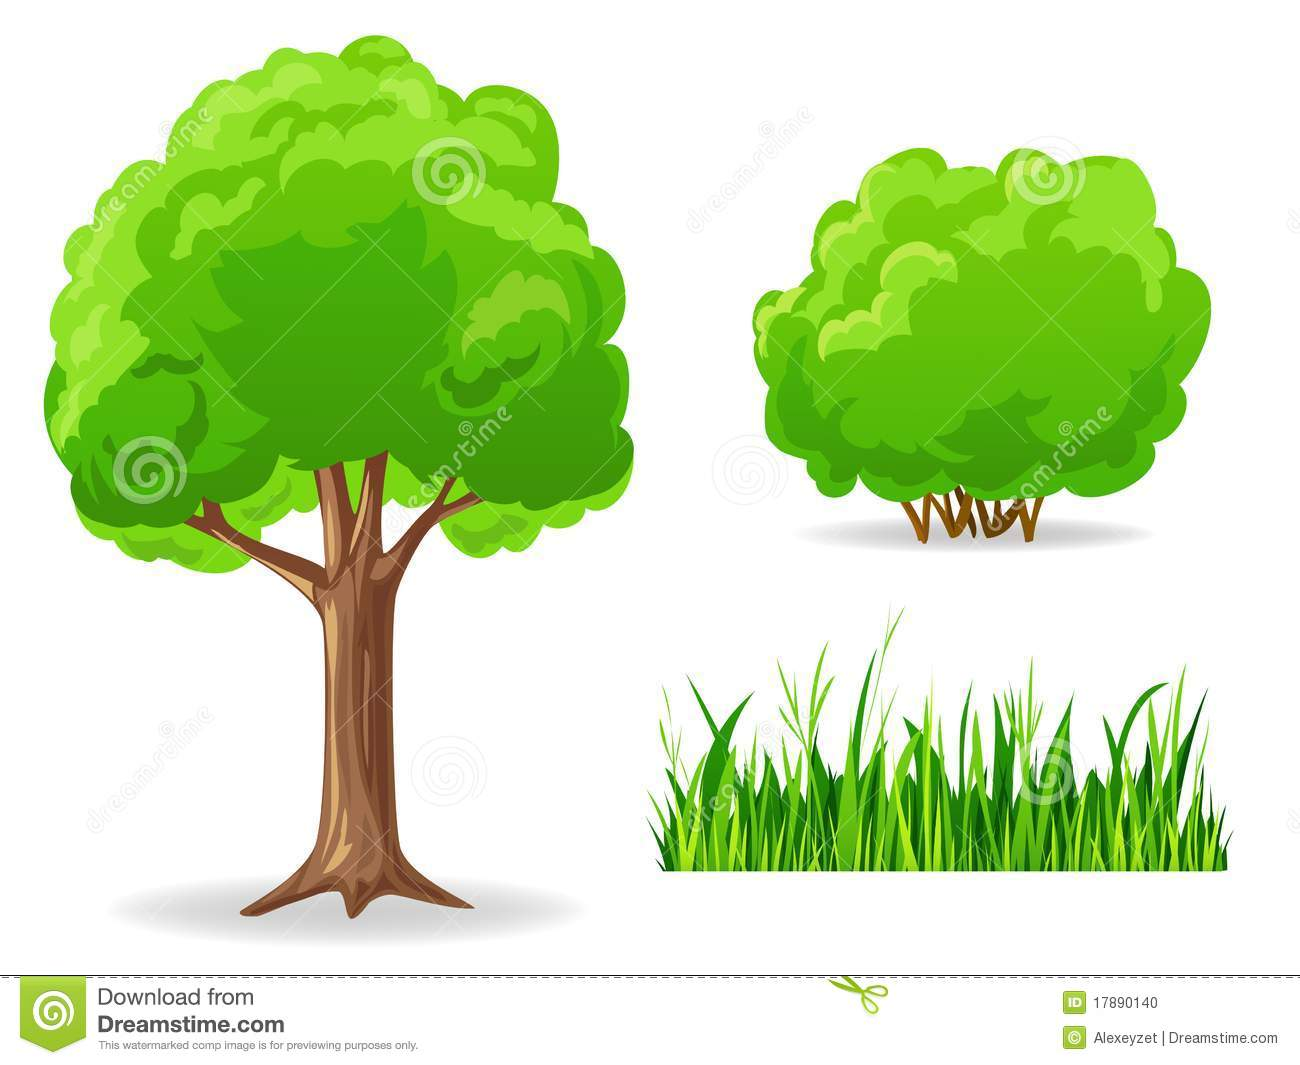 Tree and bush clipart.